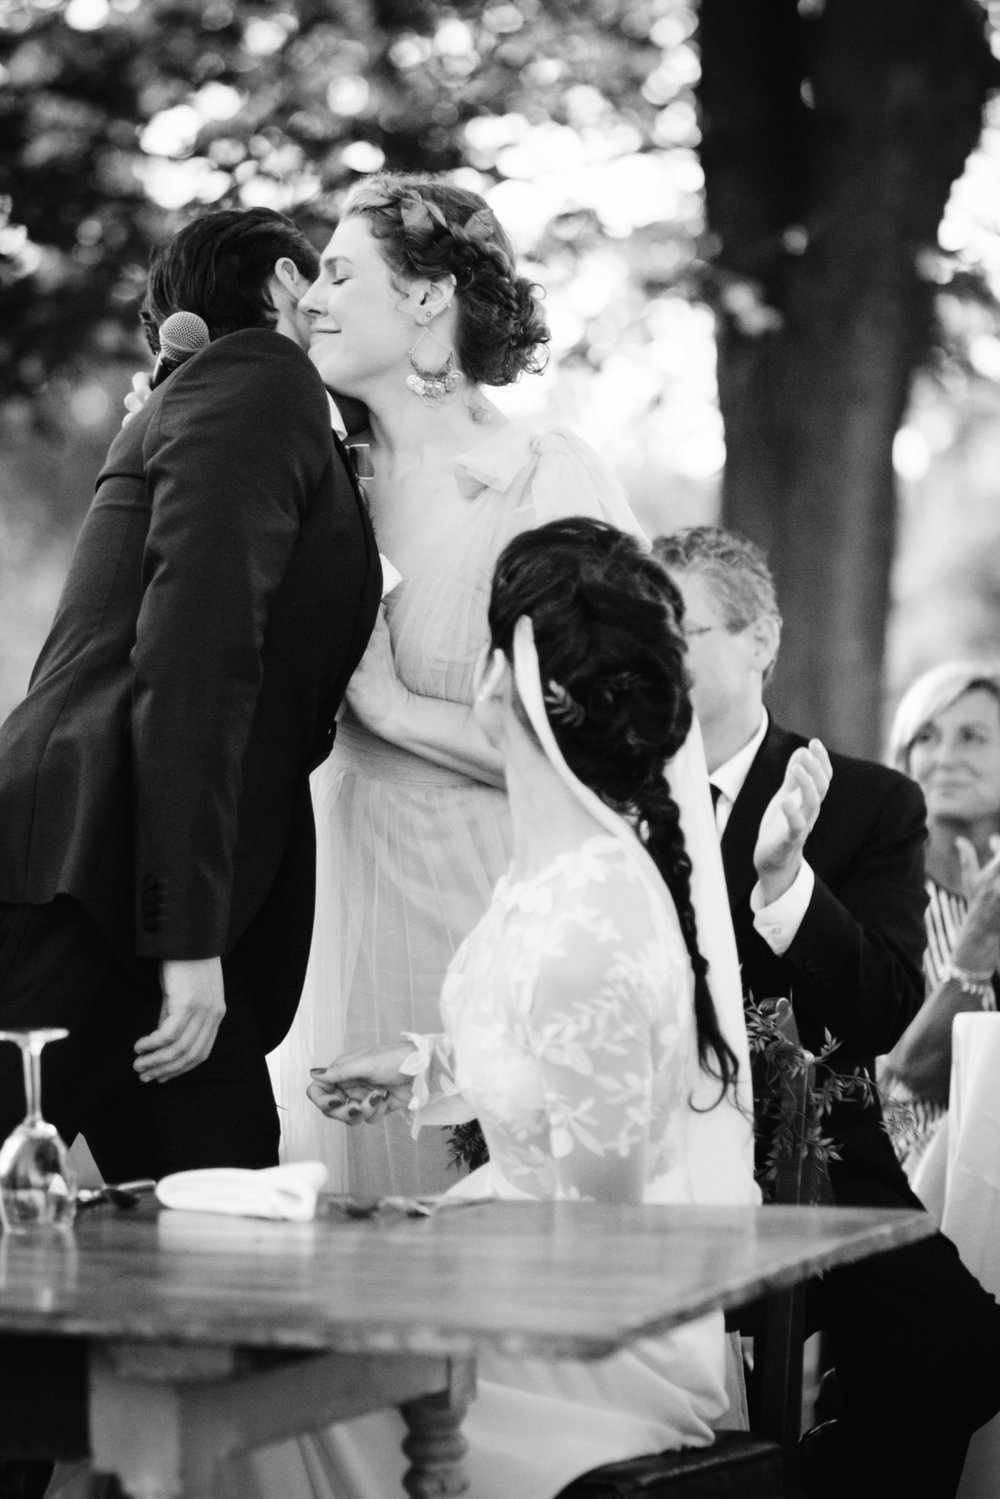 Kimberly-Coccagnia-Wedding-Photographer-233.JPG